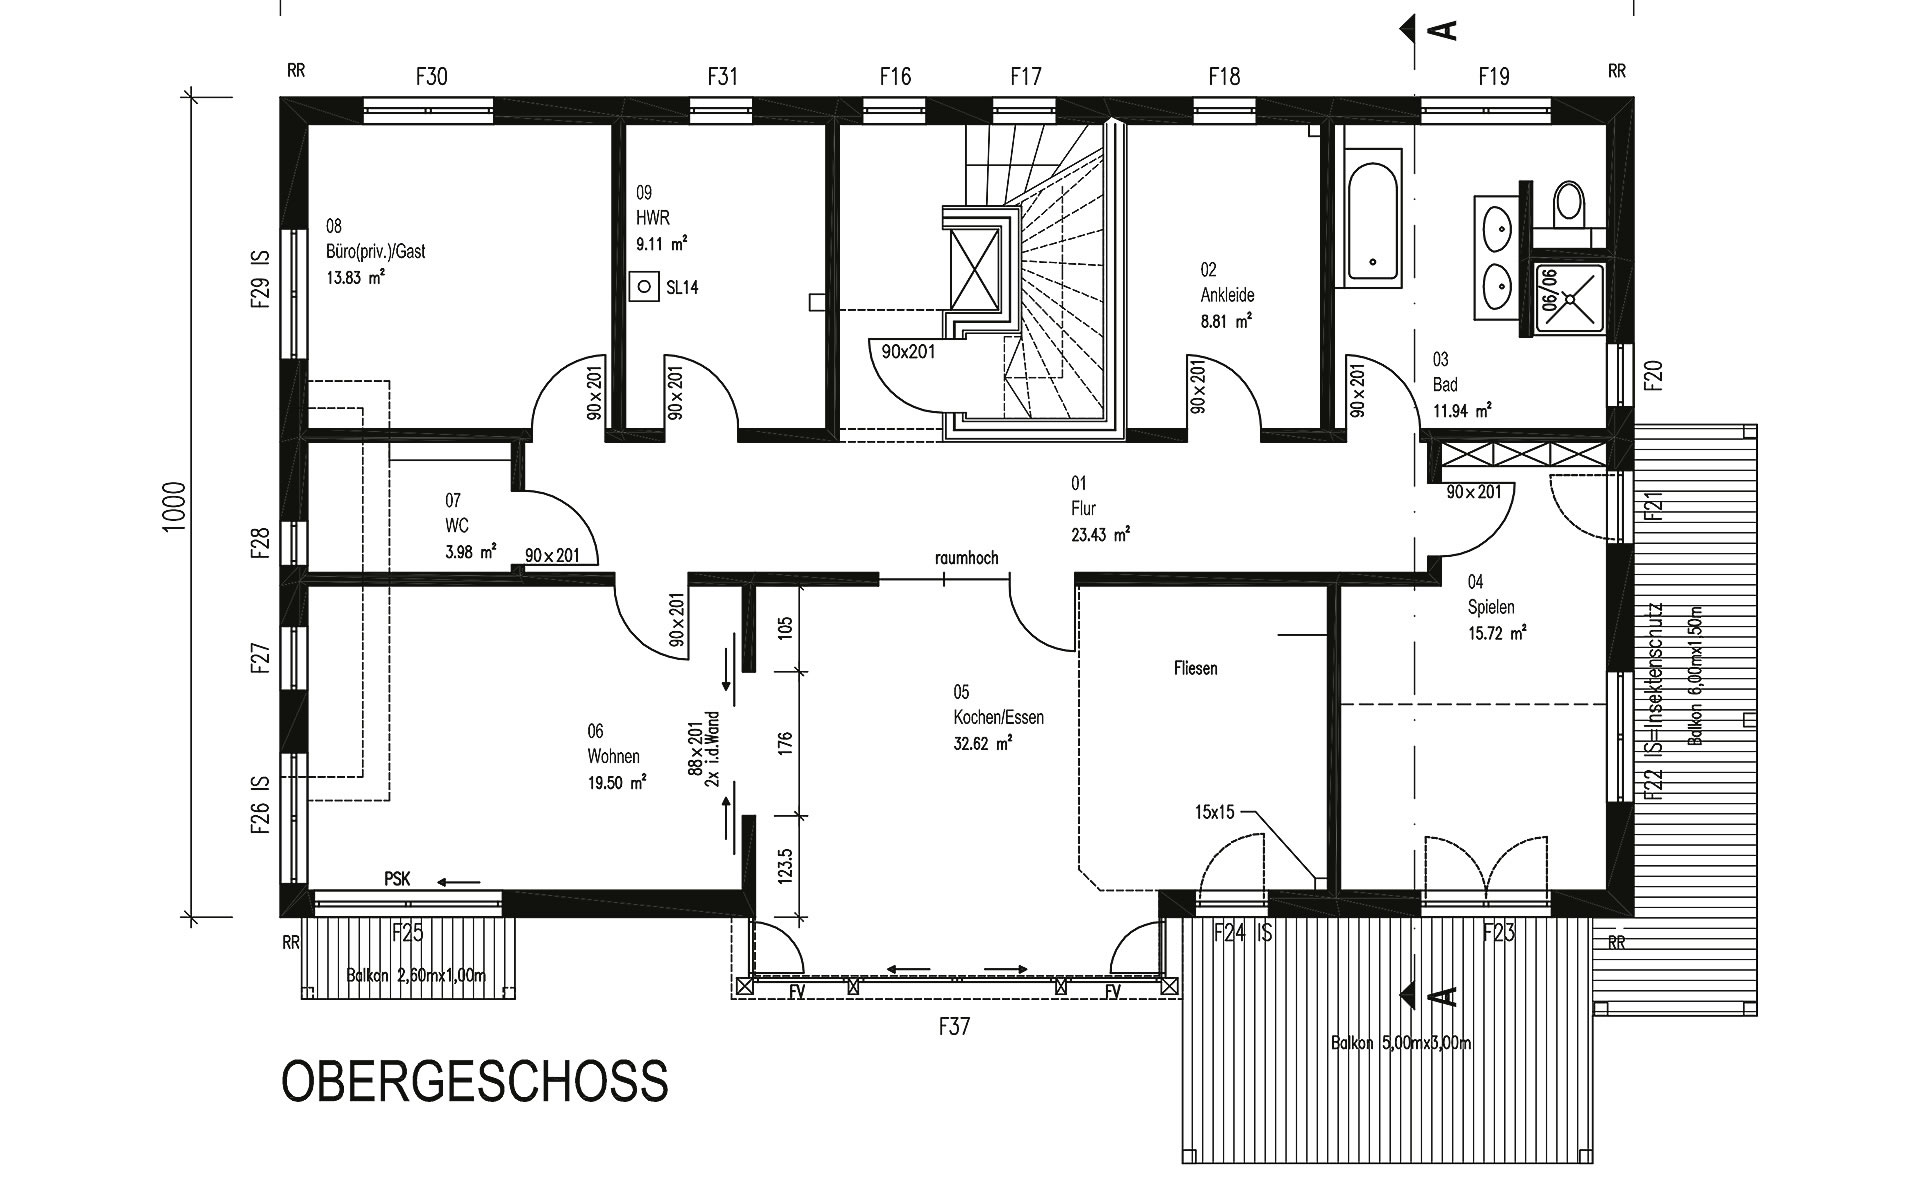 Obergeschoss Gruber von Sonnleitner Holzbauwerke GmbH & Co. KG